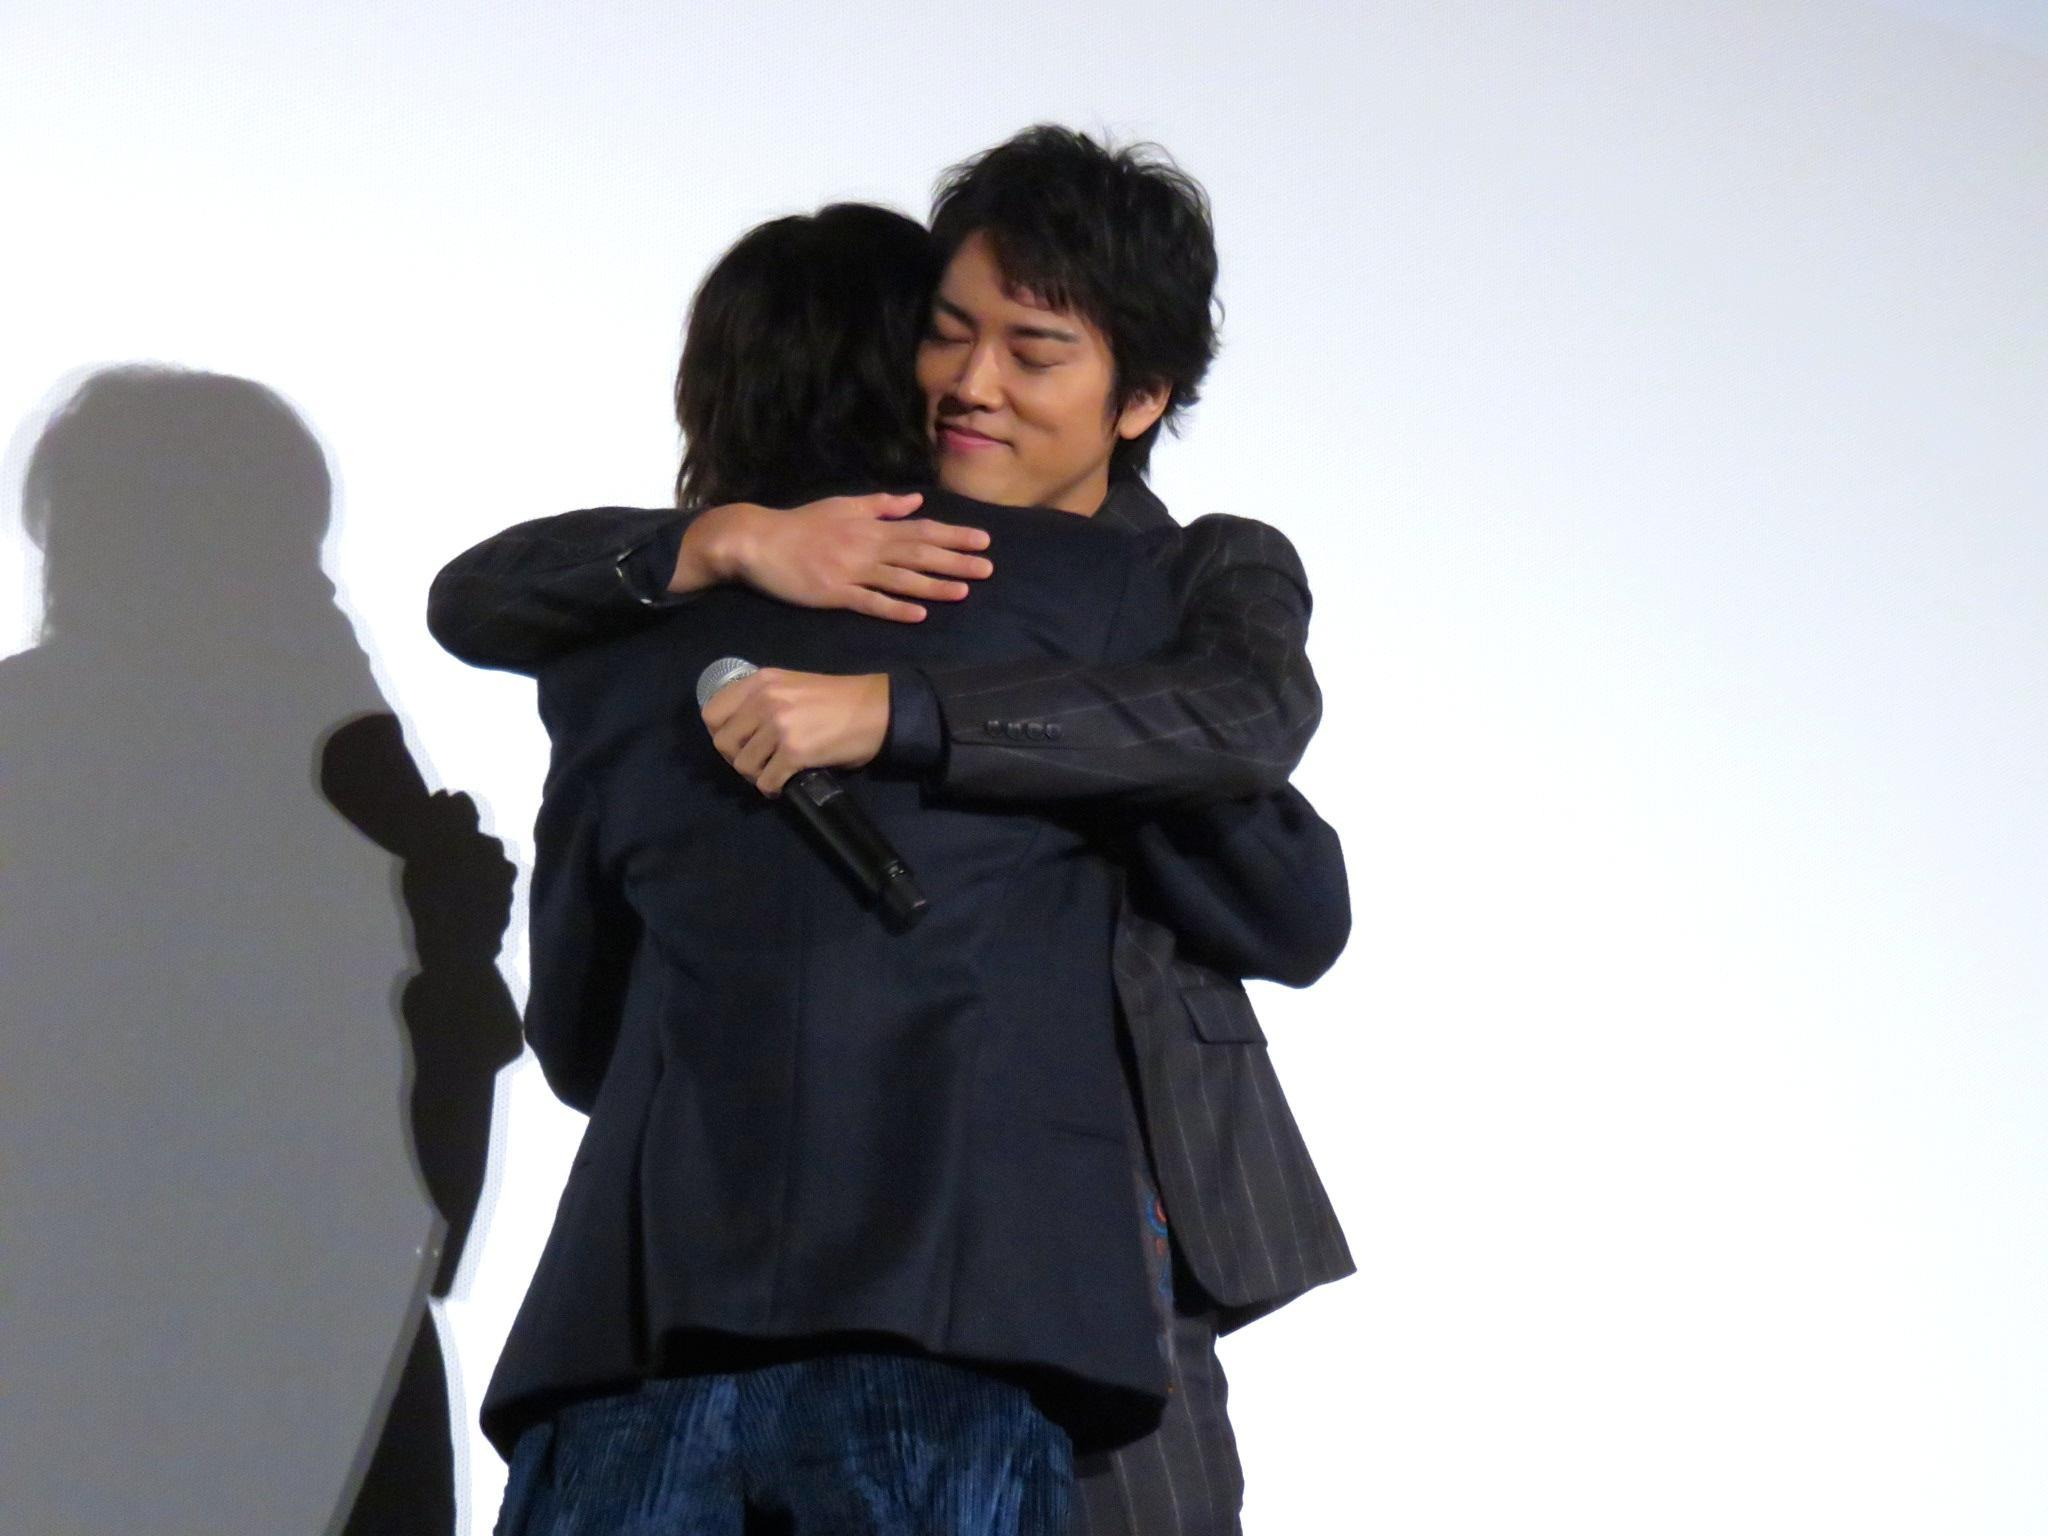 http://news.yoshimoto.co.jp/20171201003534-1aafc9f5c2ebb558410c54207f31d1854bc7f5a3.jpg